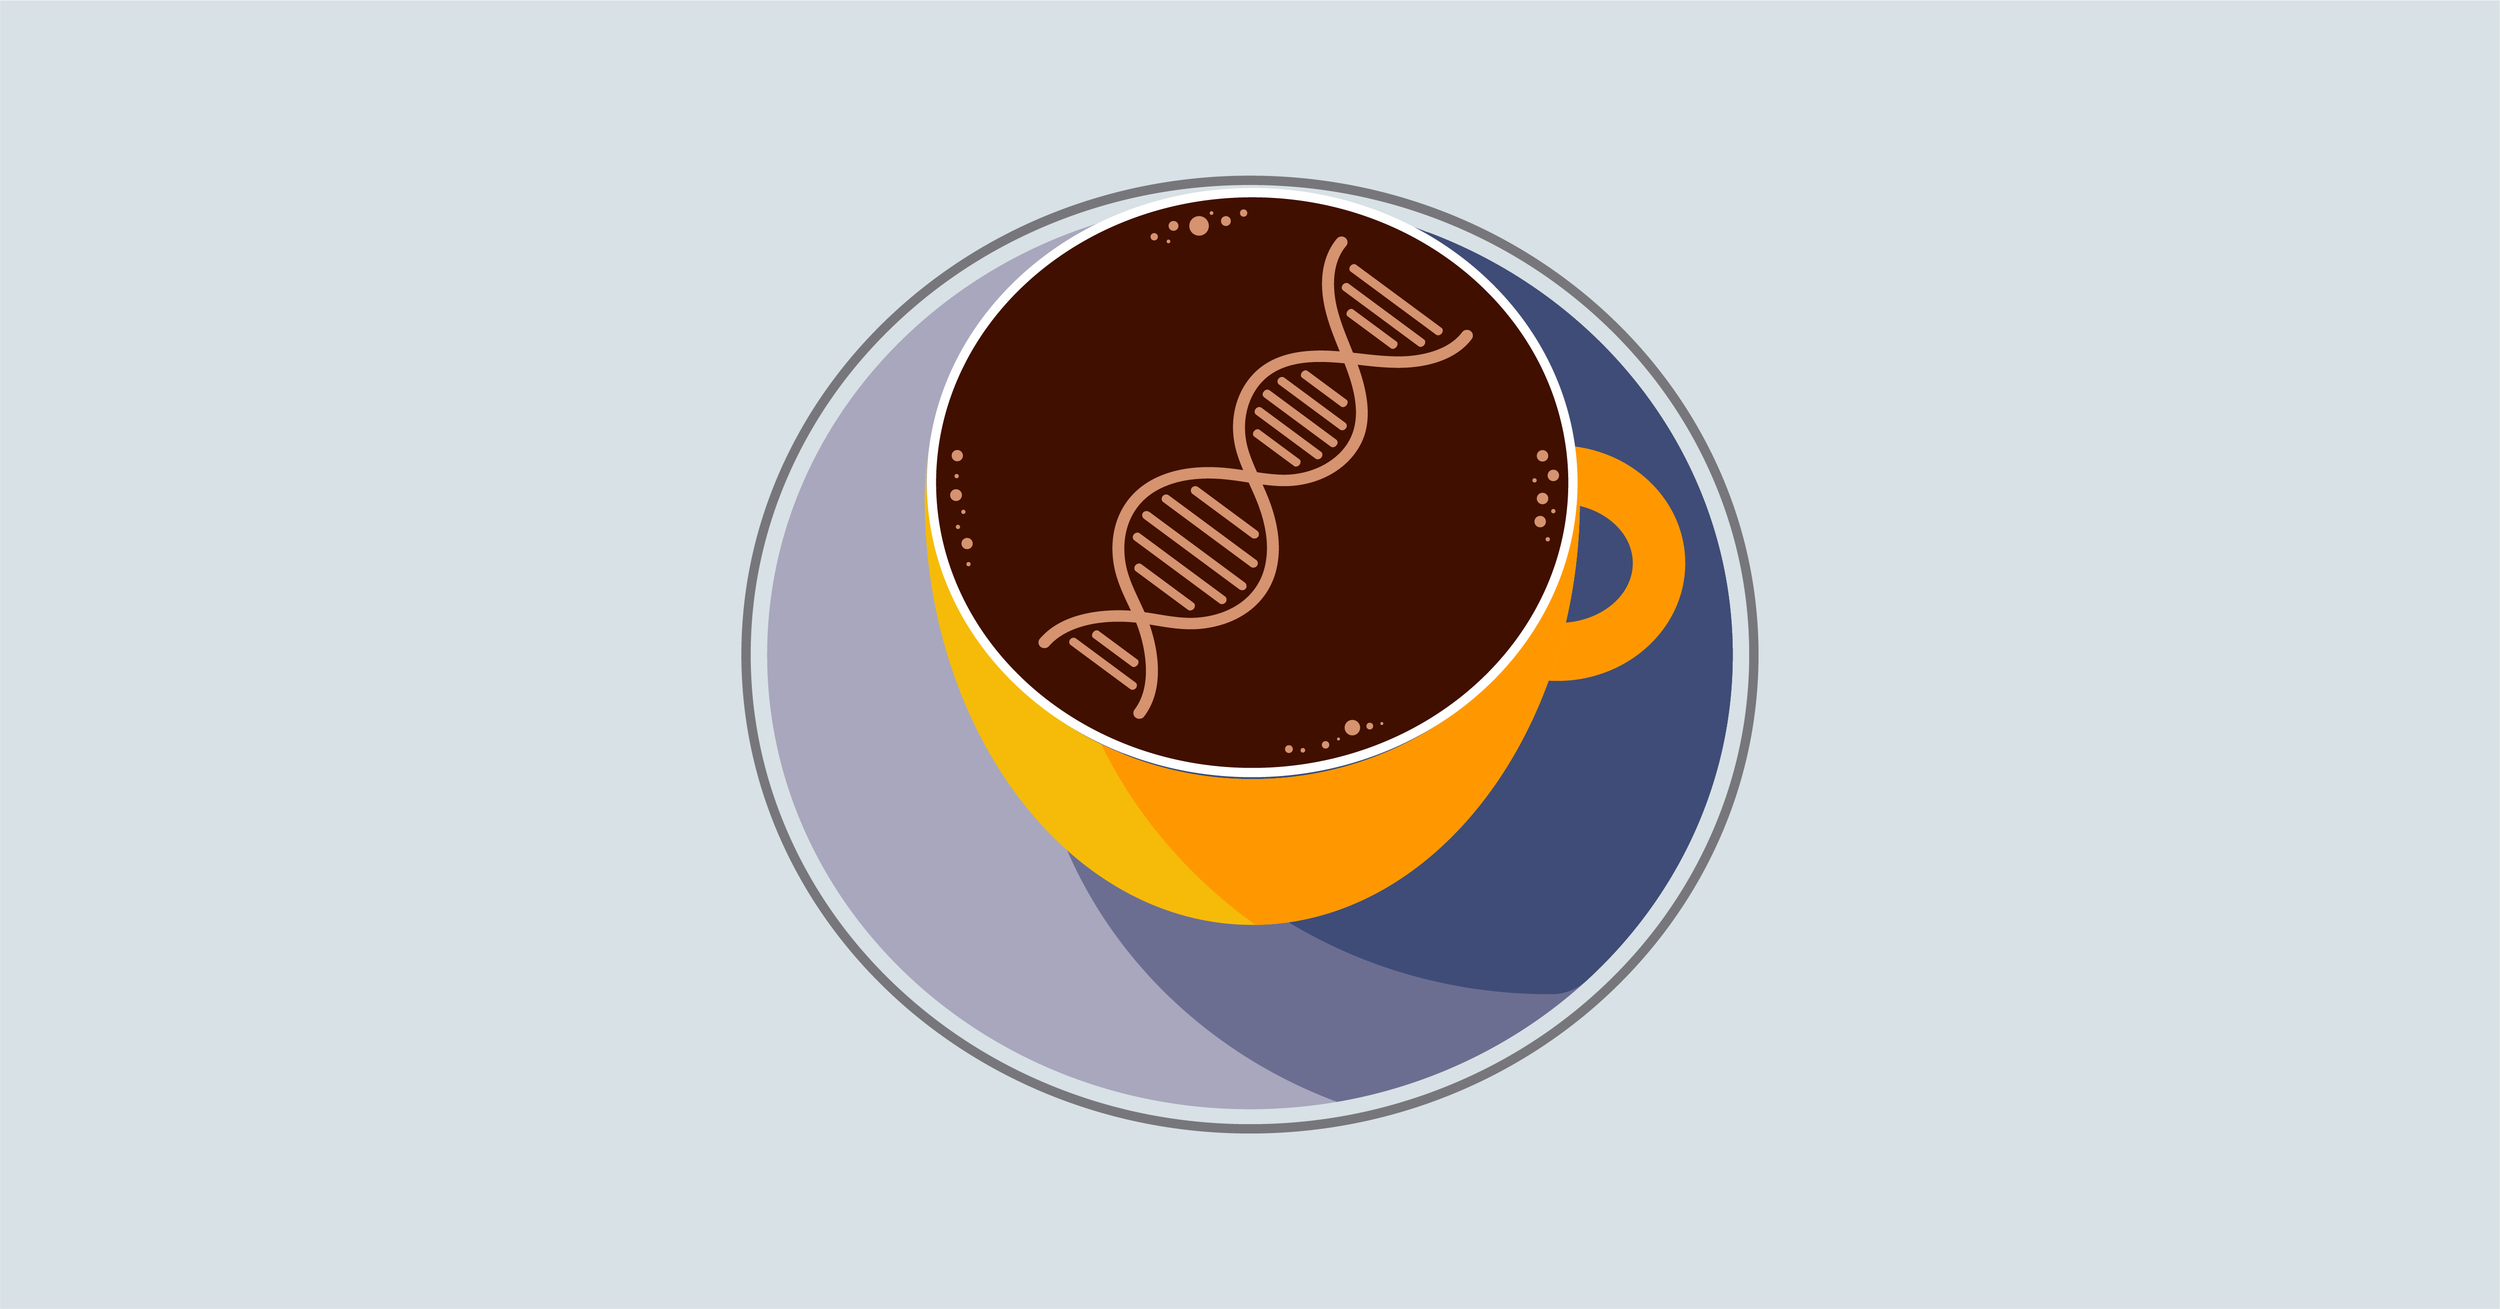 Helix_10_caffeinesensitivity_2400x1256_x2_Artboard 2.png